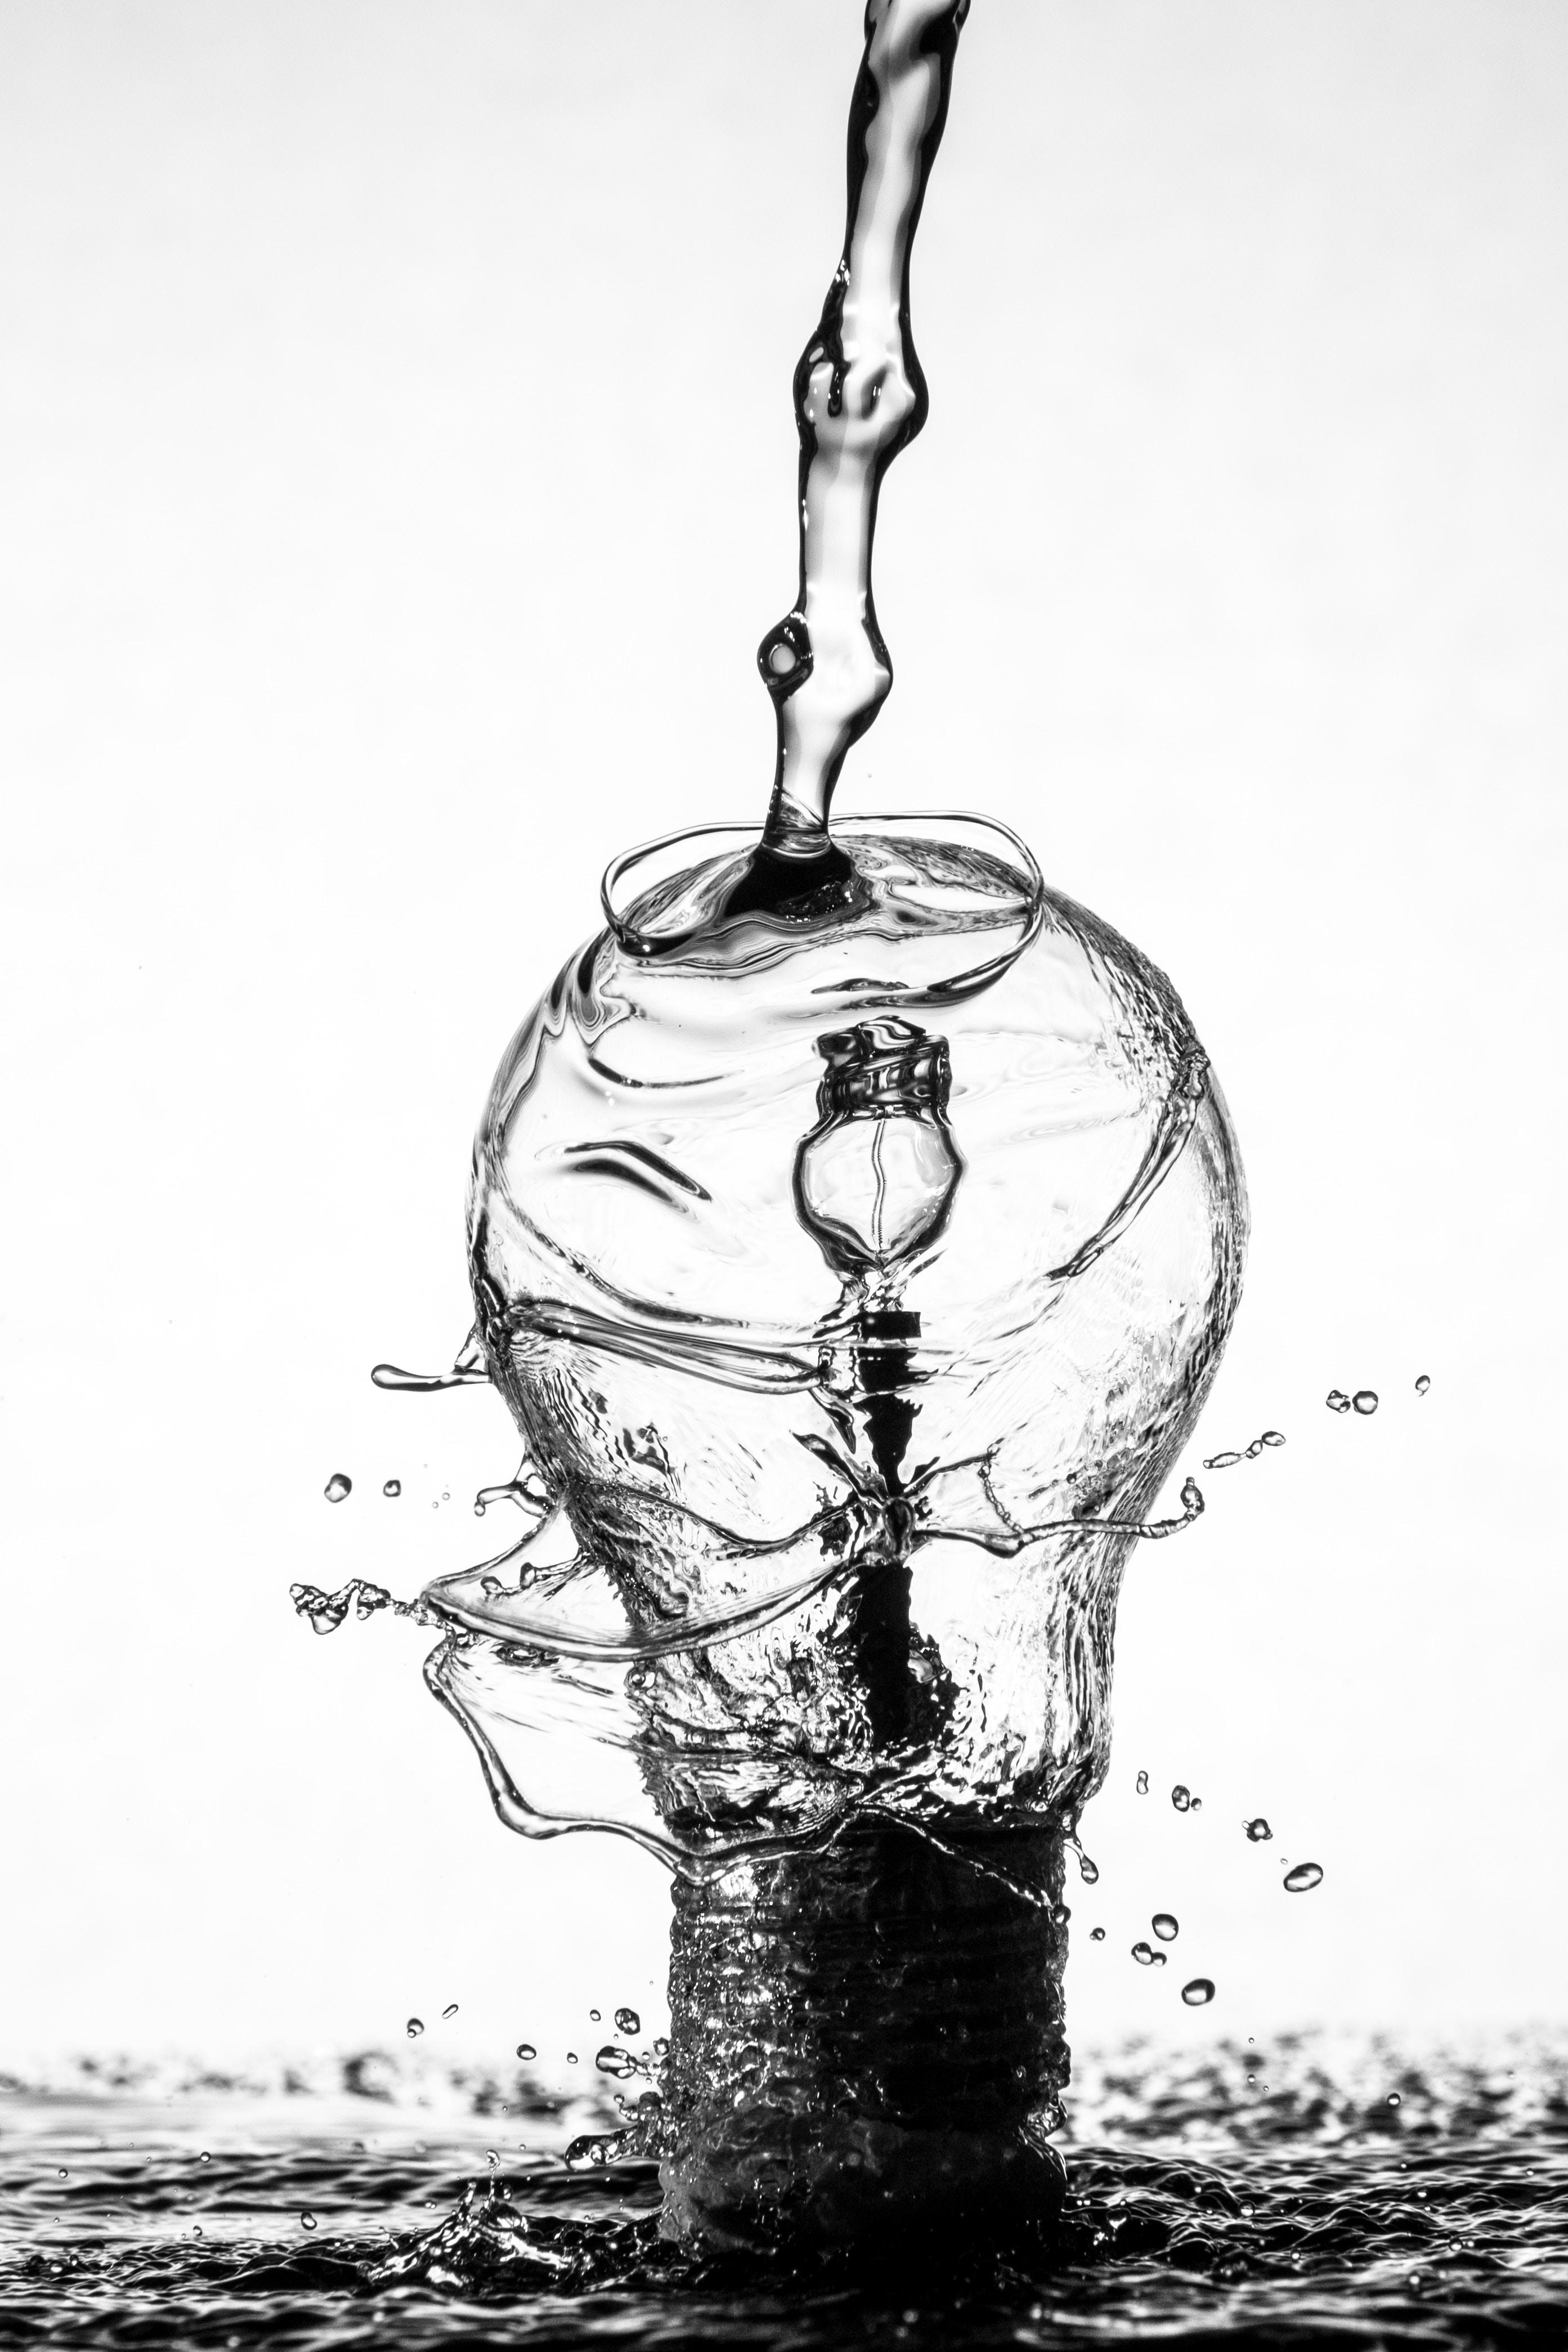 Idea Lightbulb photo by Sharon Pittaway on Unsplash